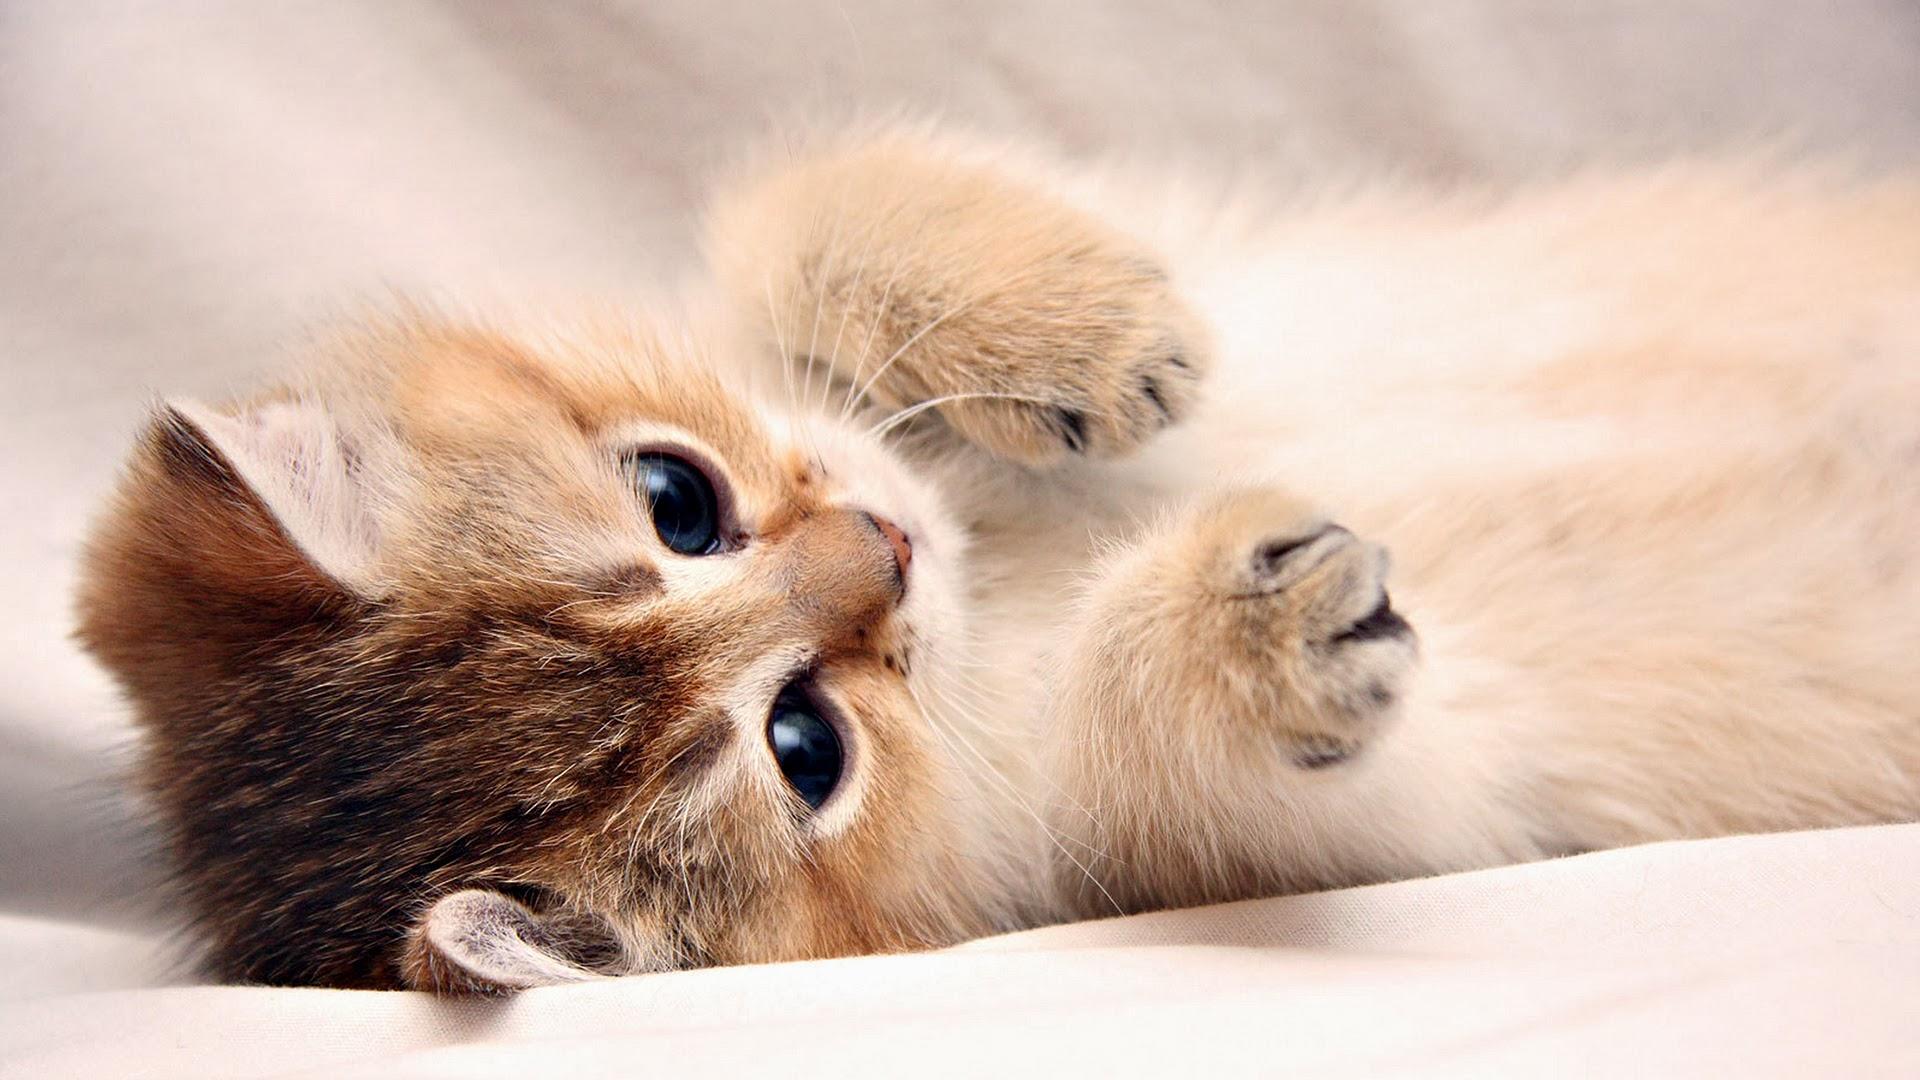 cute kitten cat animals hd wallpaper image photo picture 1920x1080